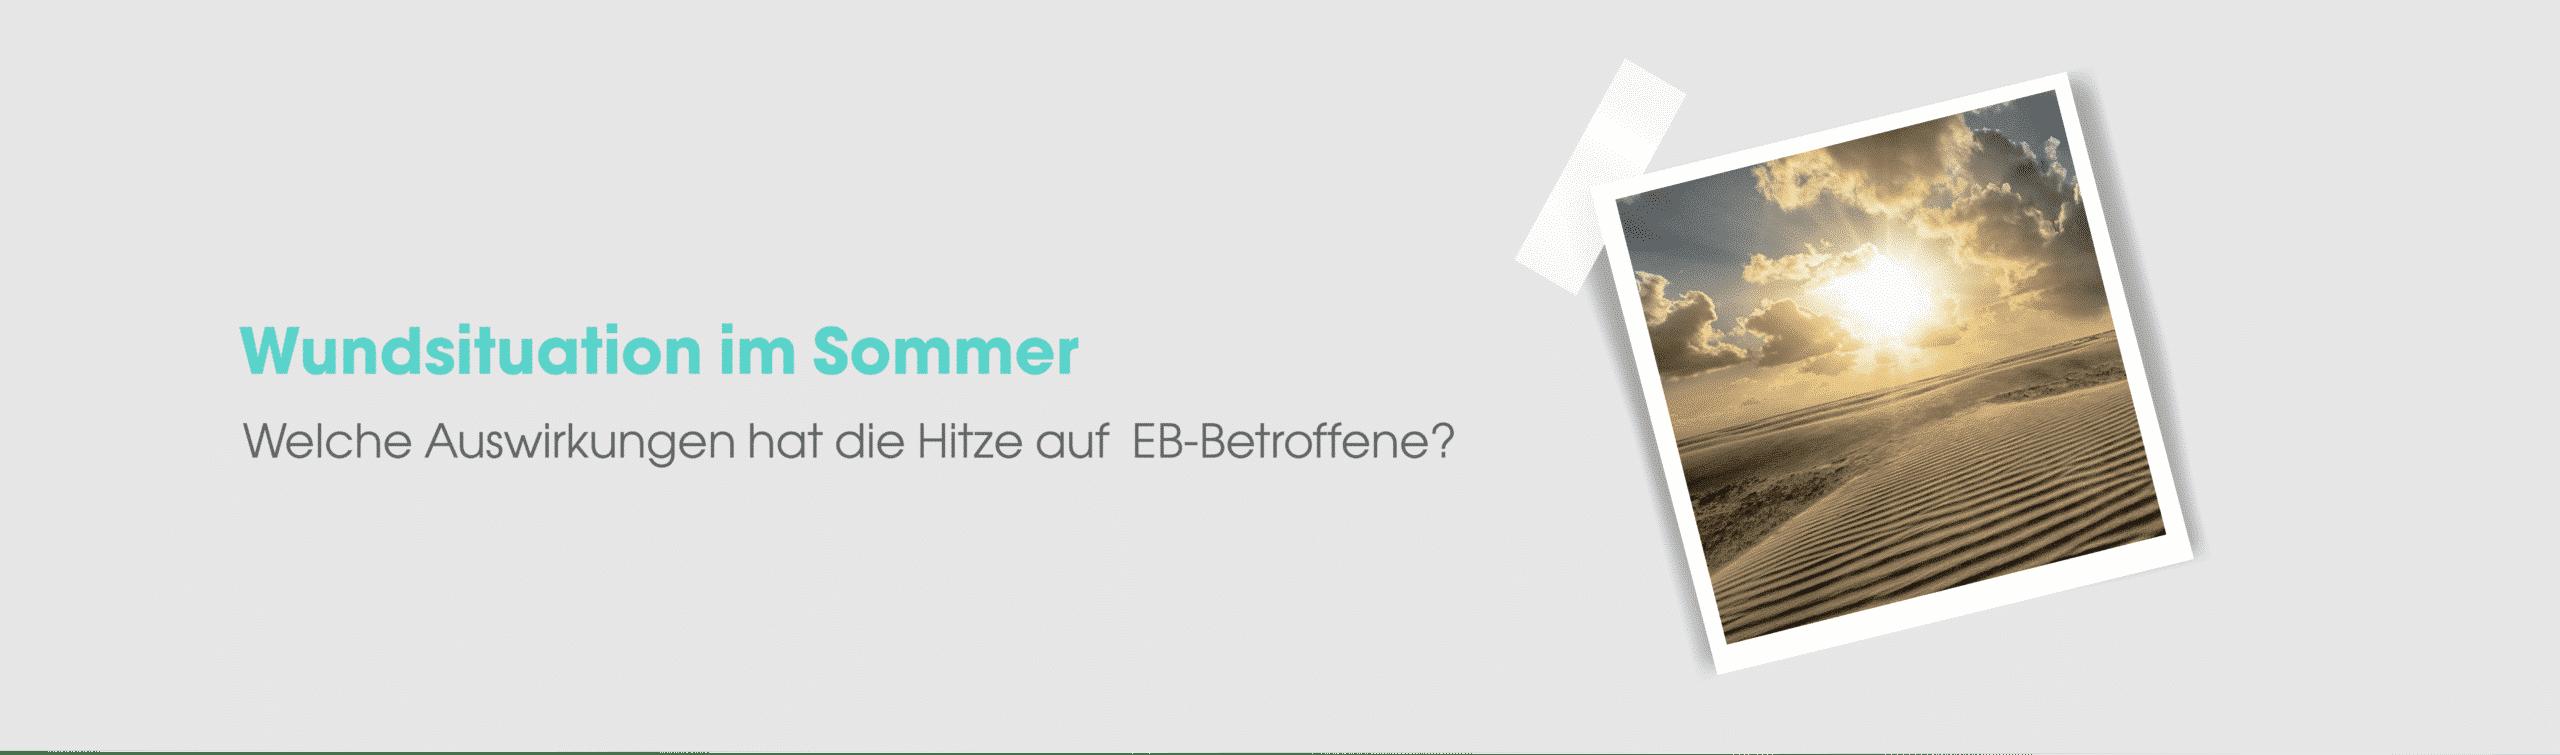 epidermolysis-bullosa-blog-sommer-header